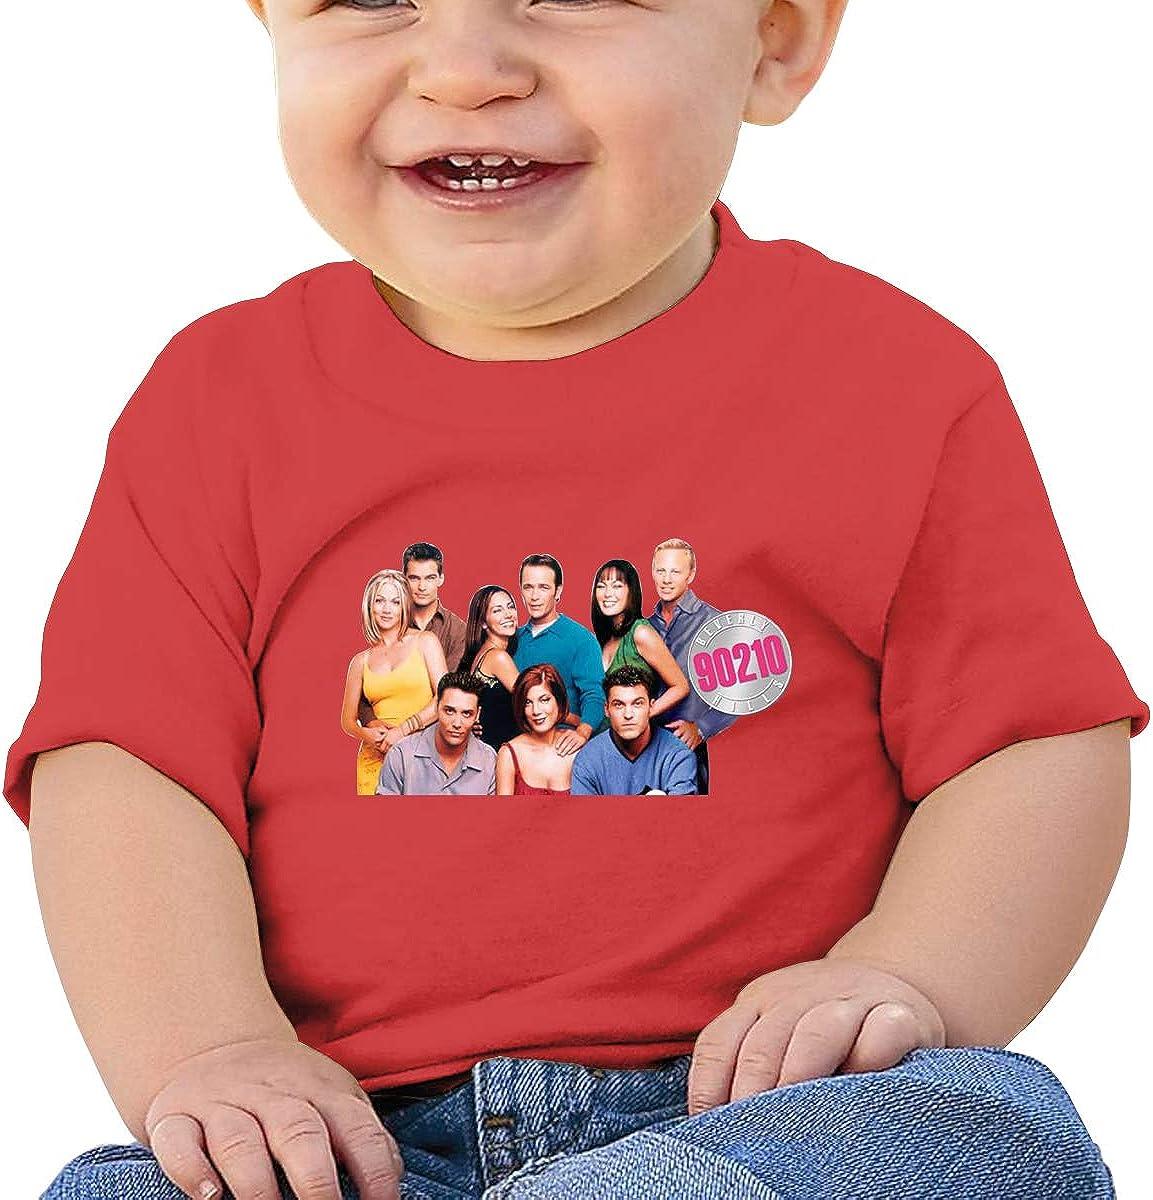 LIIREN Bever/_ly HIL/_ls 90210 Sign Tee Design Summer Tshirts for Baby Boy Black